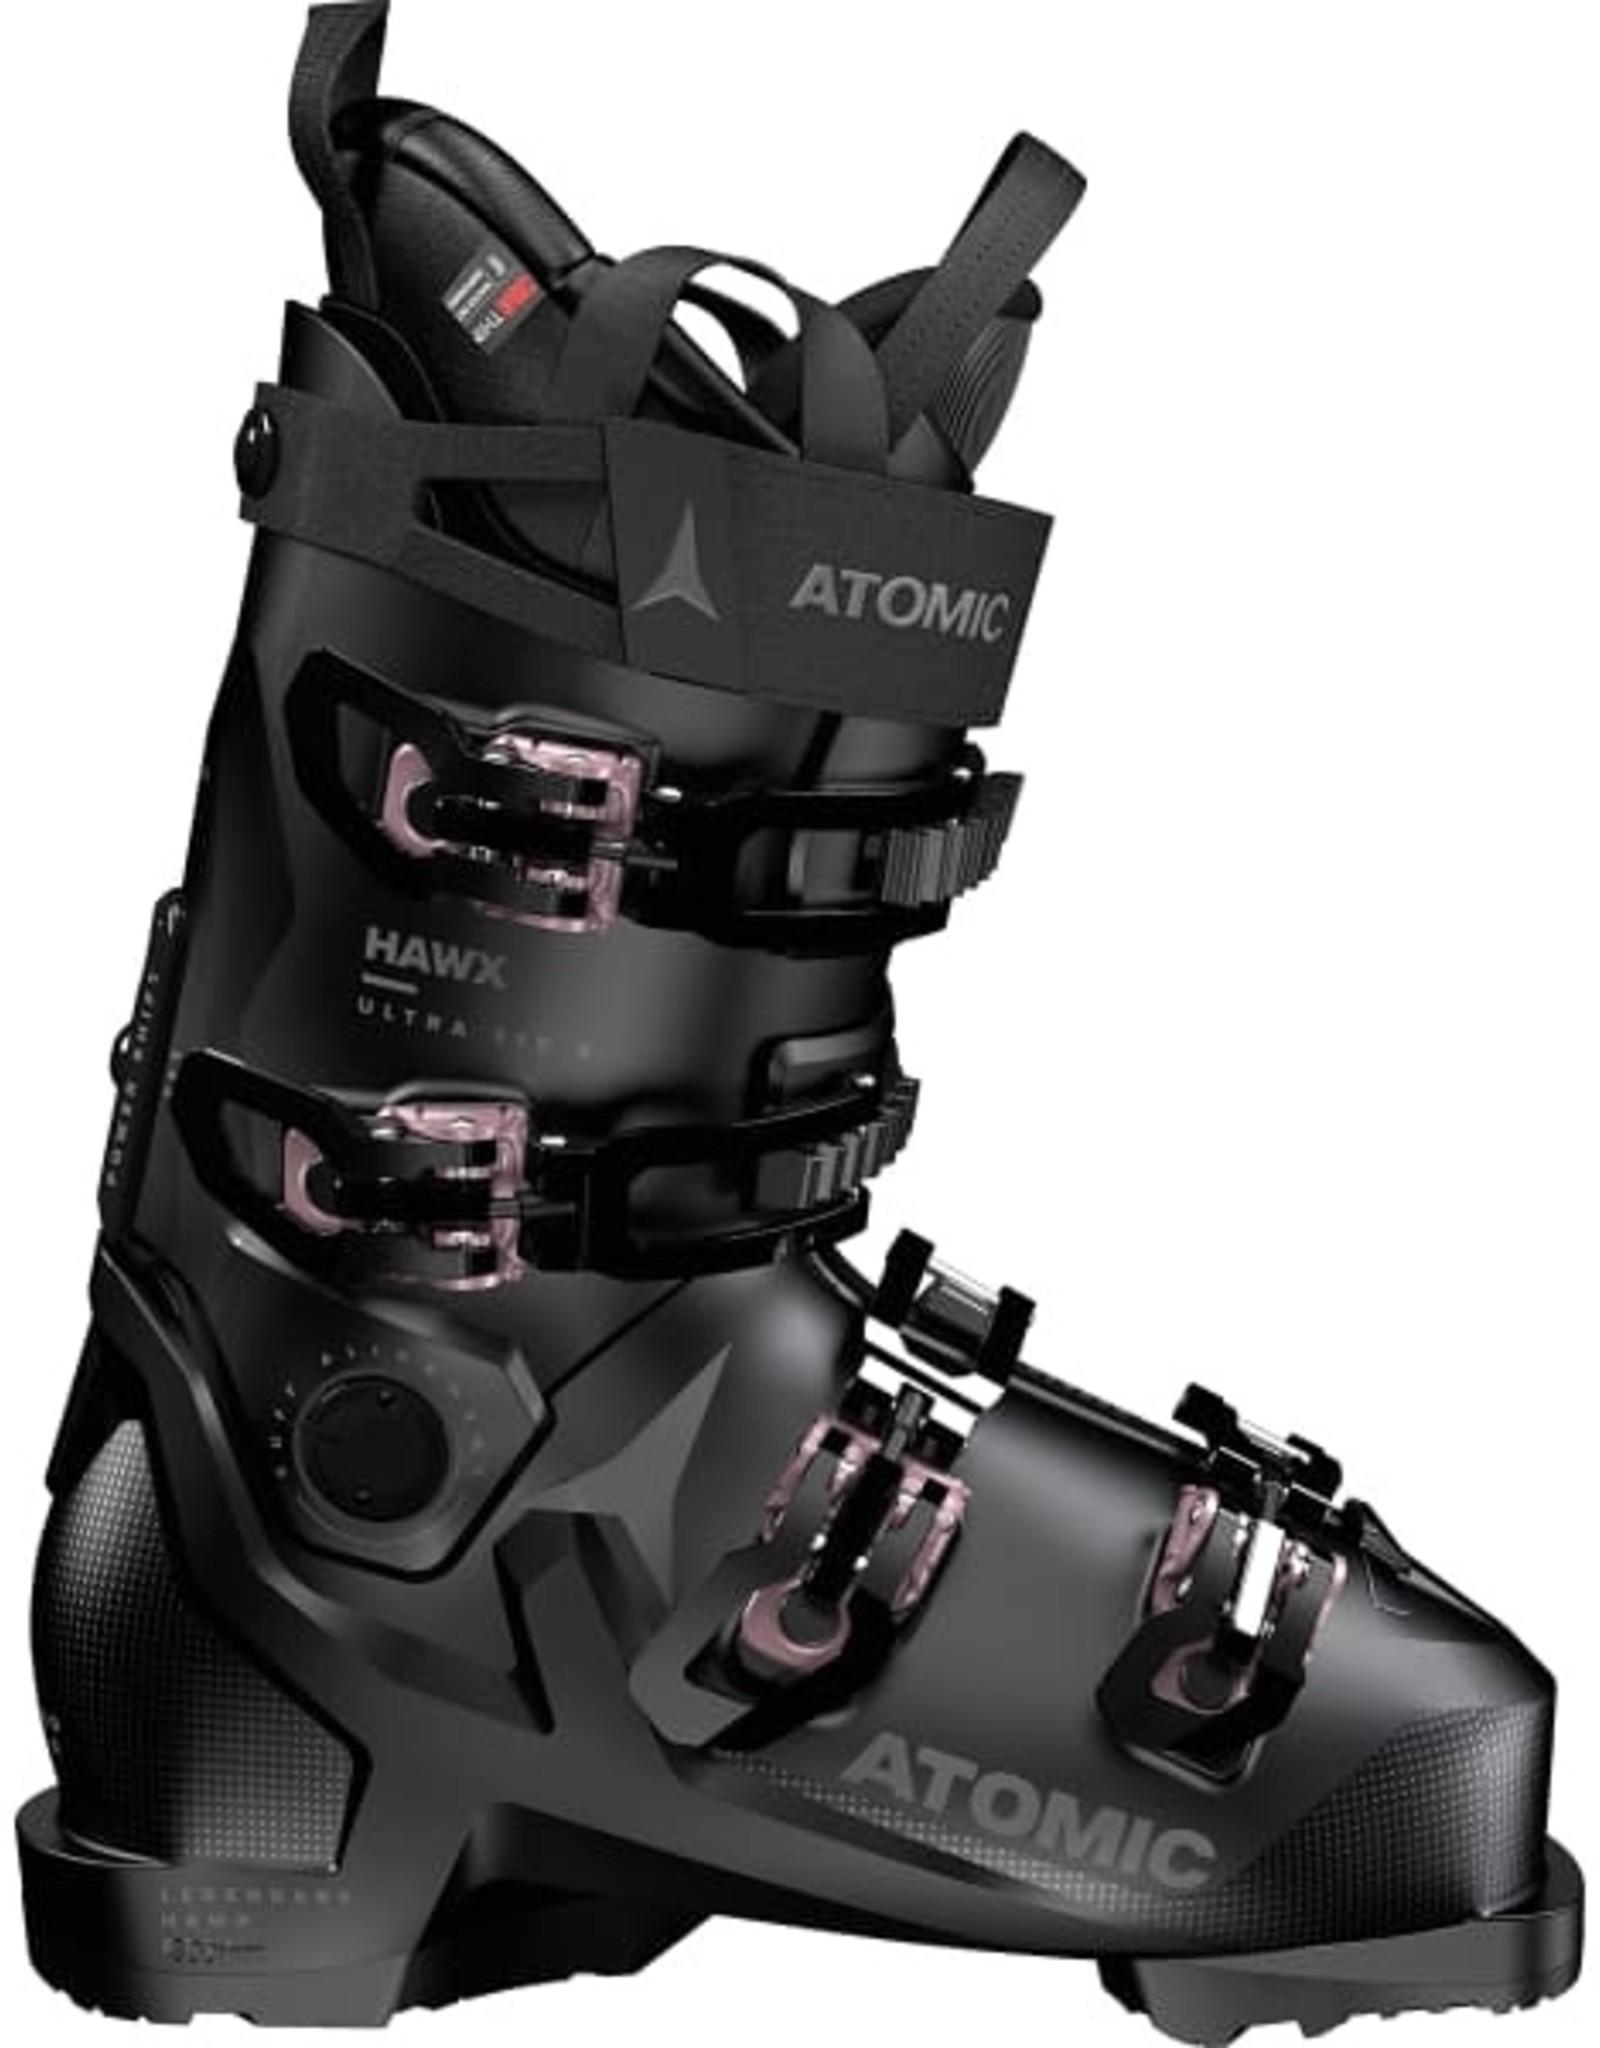 ATOMIC ATOMIC Ski Boots HAWX ULTRA 115 S W GW (21/22)